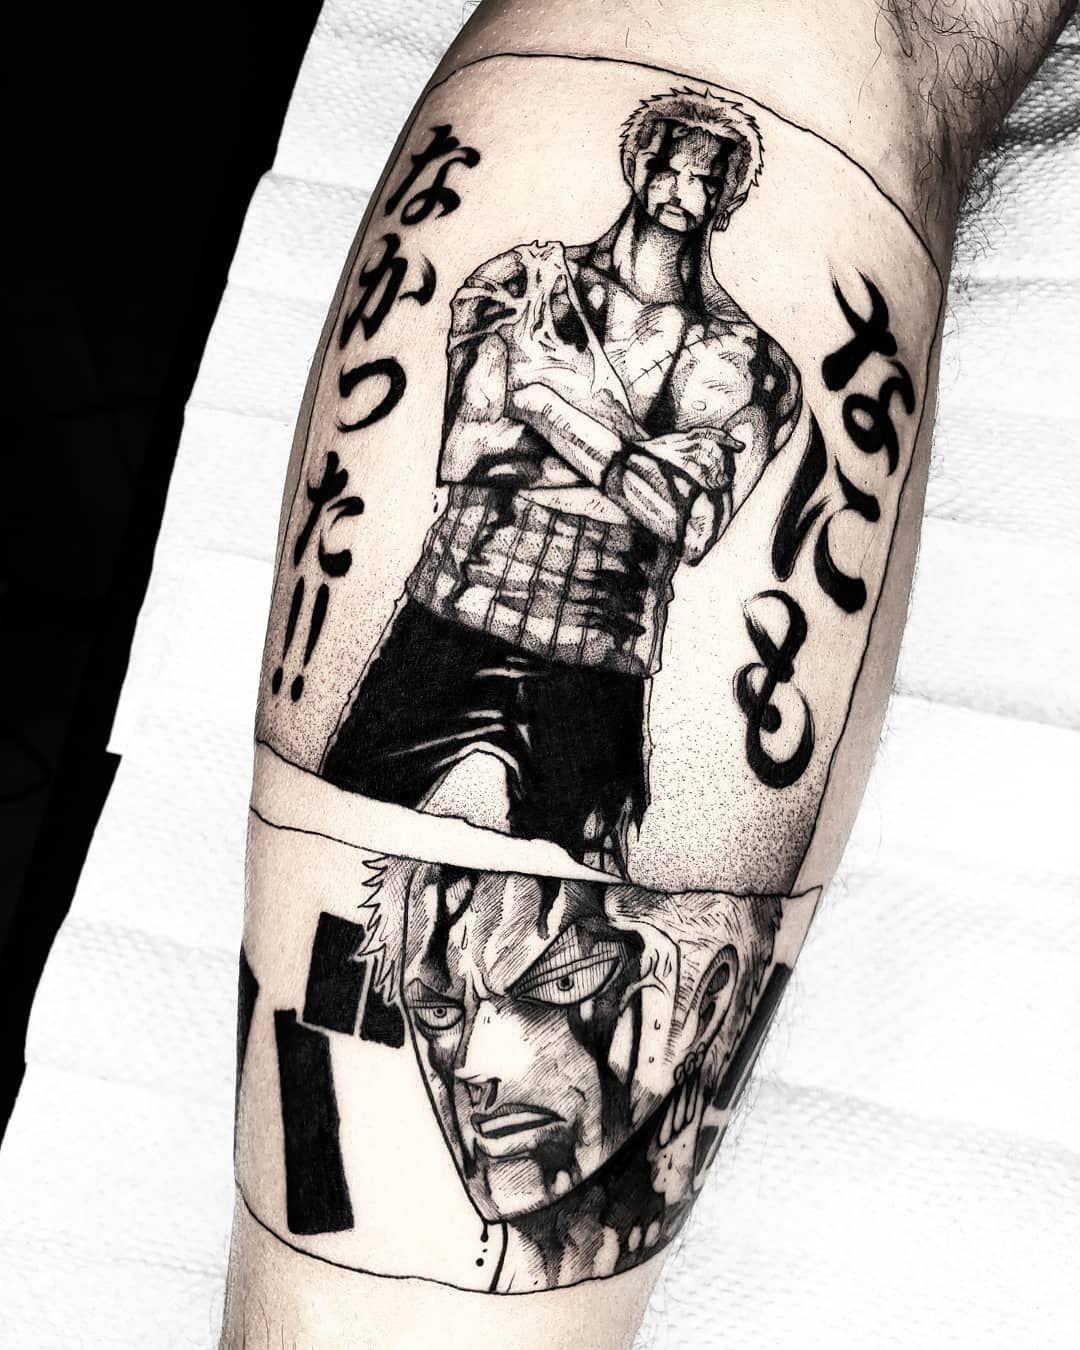 Felipe Kross En Instagram Nothing Nothing At All Roronoa Zoro Best Scene For The Amazing Marc T In 2020 Roronoa Zoro One Piece Tattoos Anime Tattoos